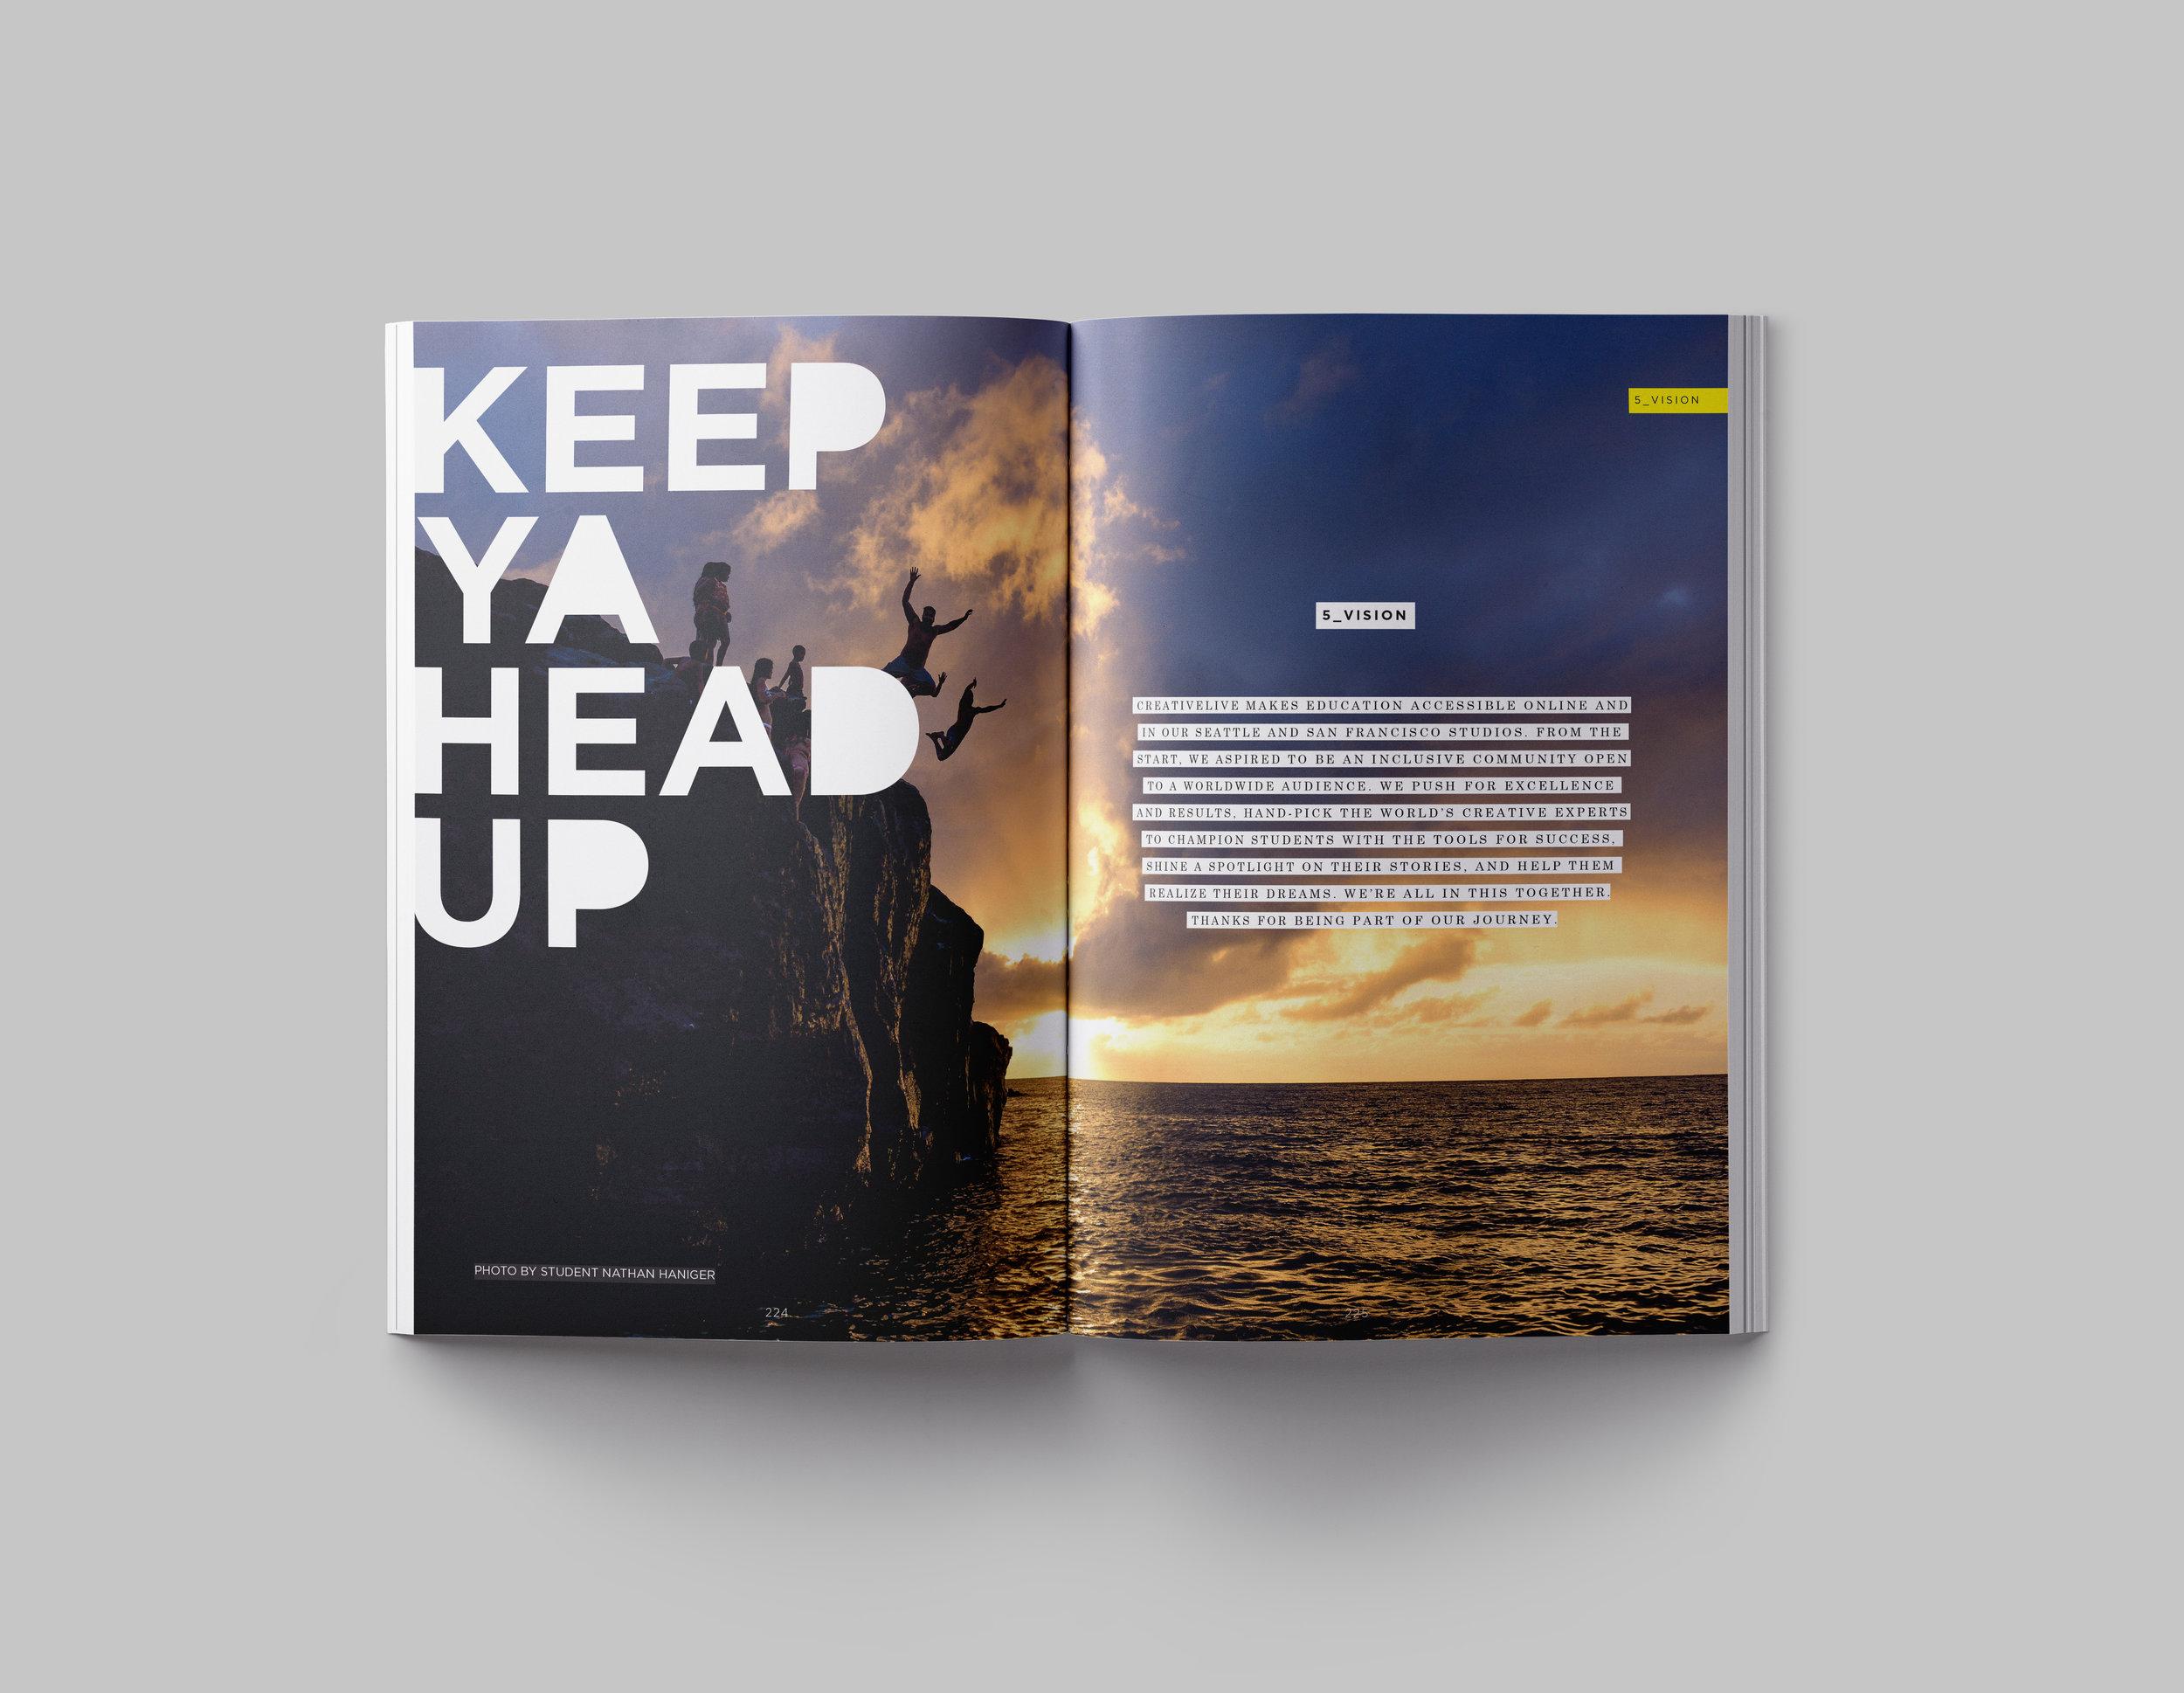 Magazine-USLetter-A4-Mockup-Template_spread11_PYHU.jpg